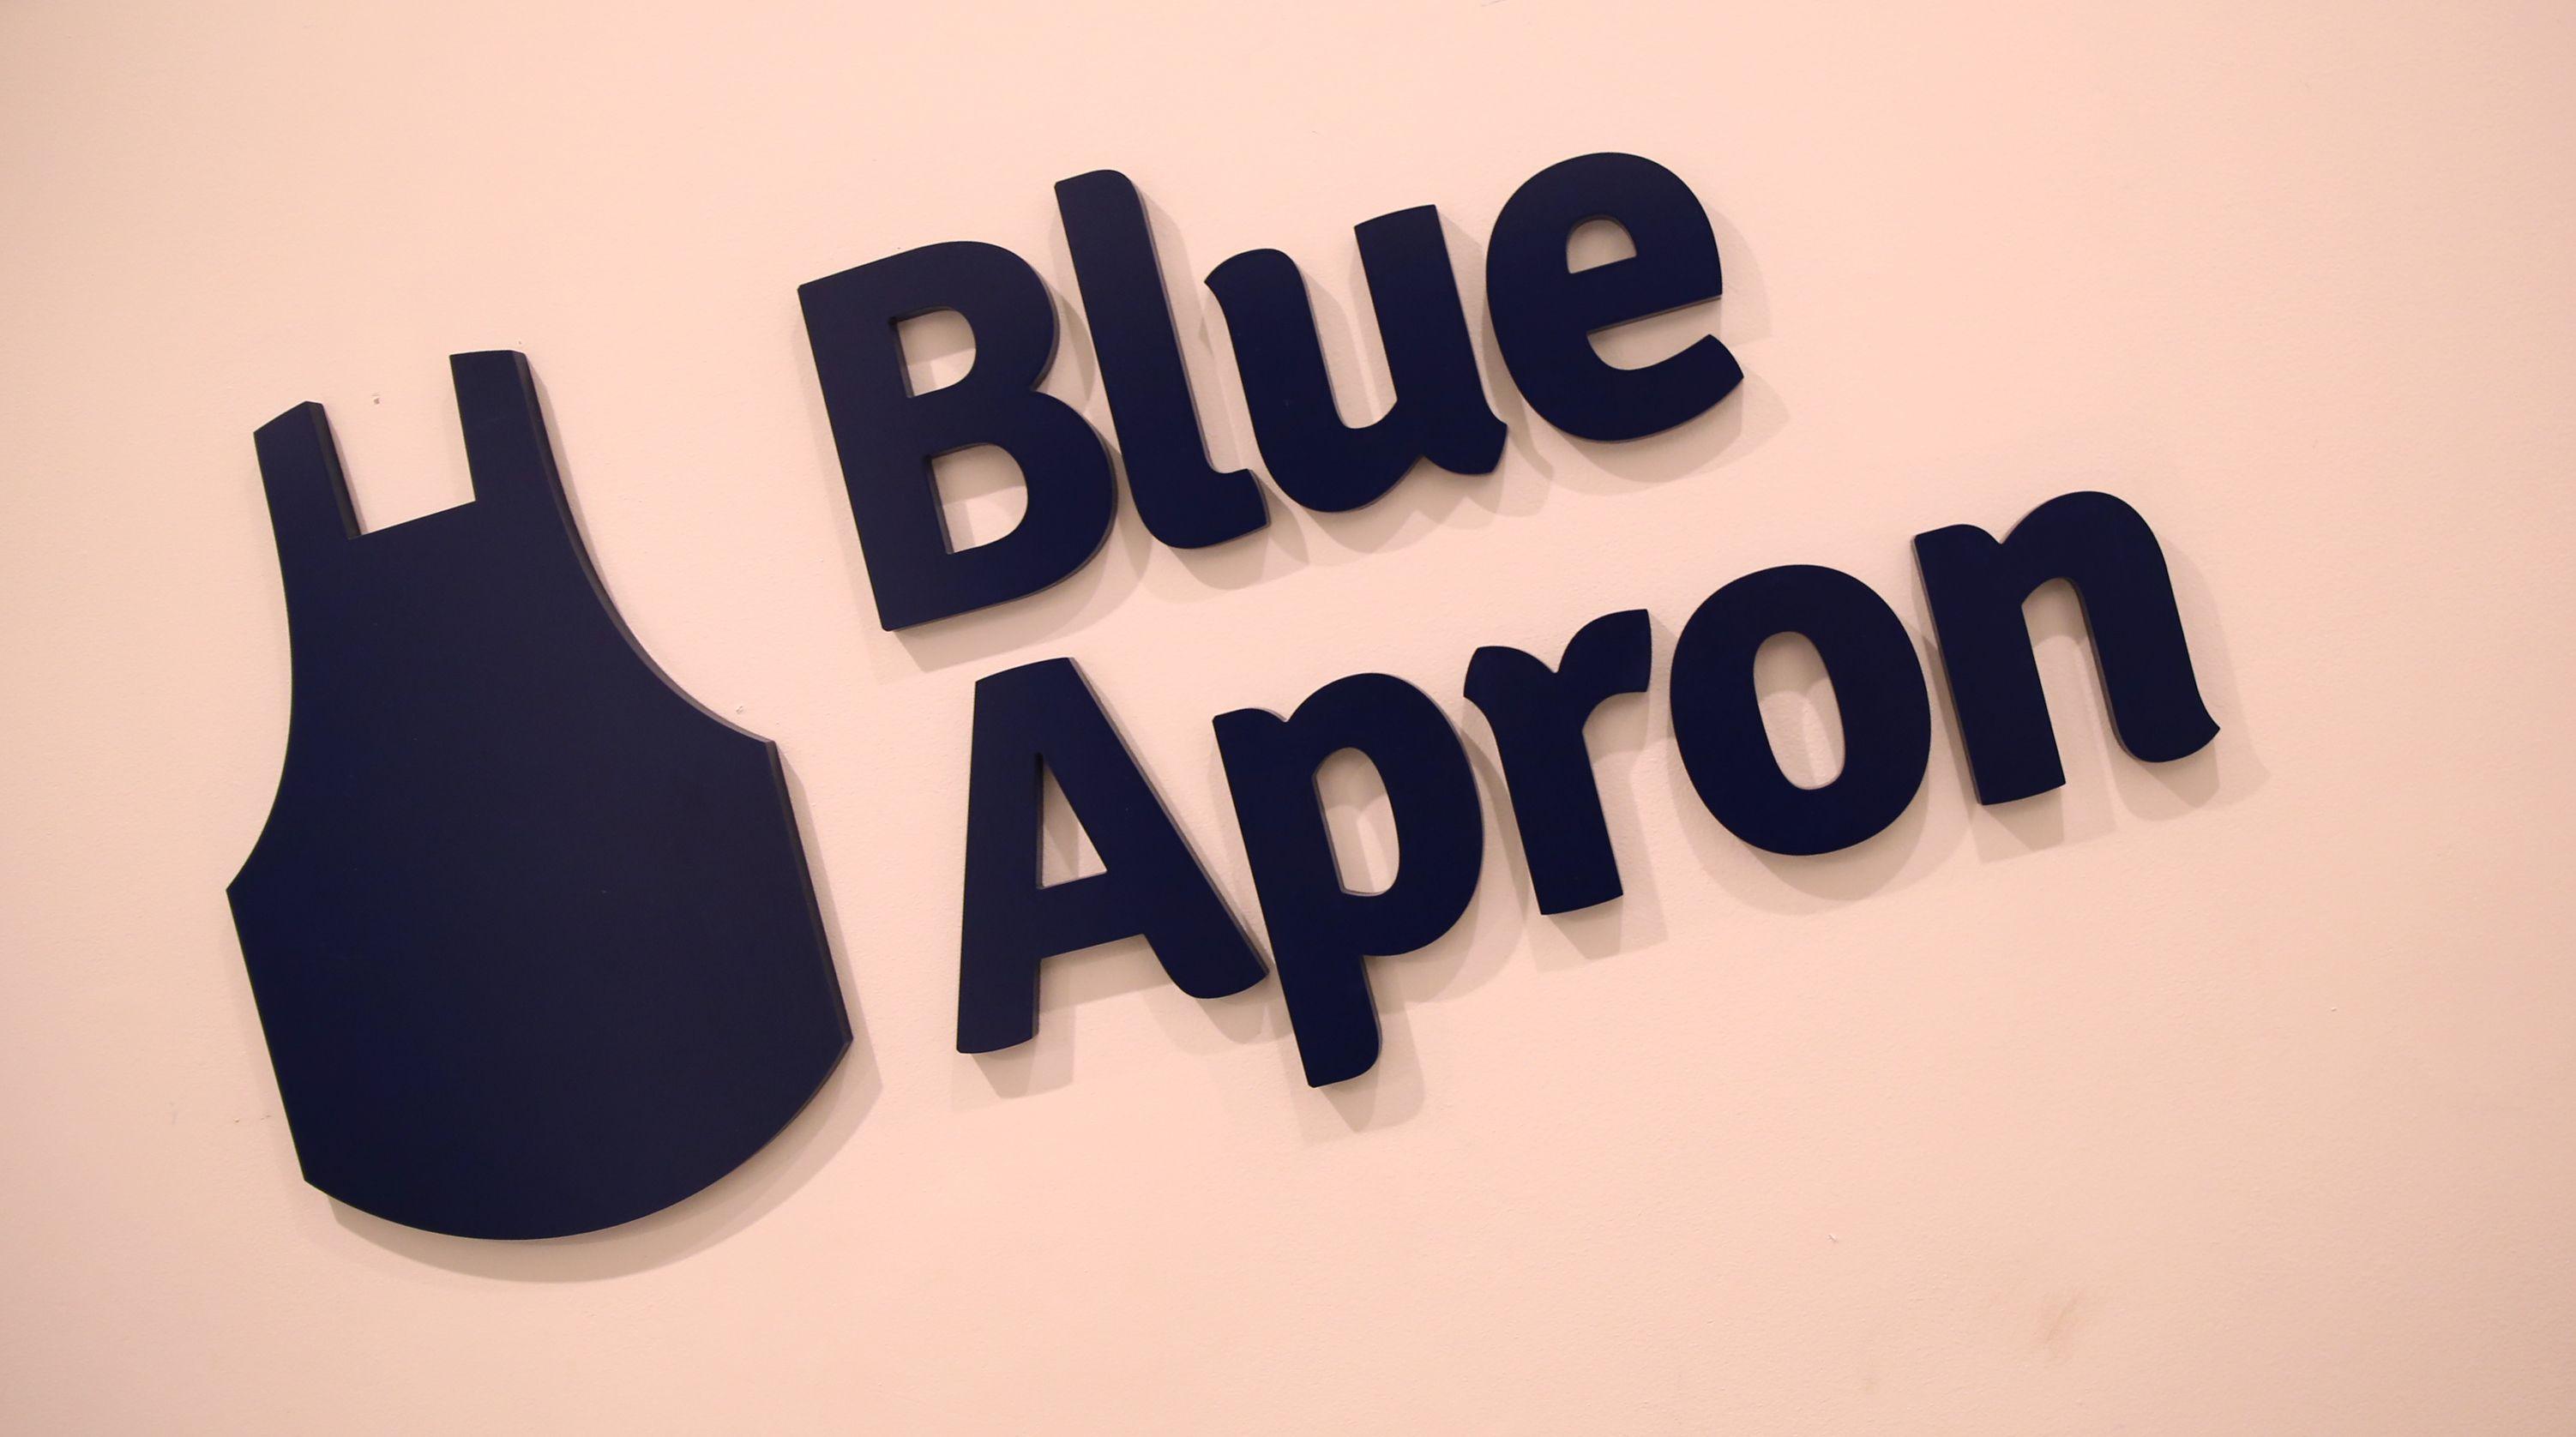 Blue apron interview - An Interview With Blue Apron Ceo Matt Salzberg Http Www Baindaily